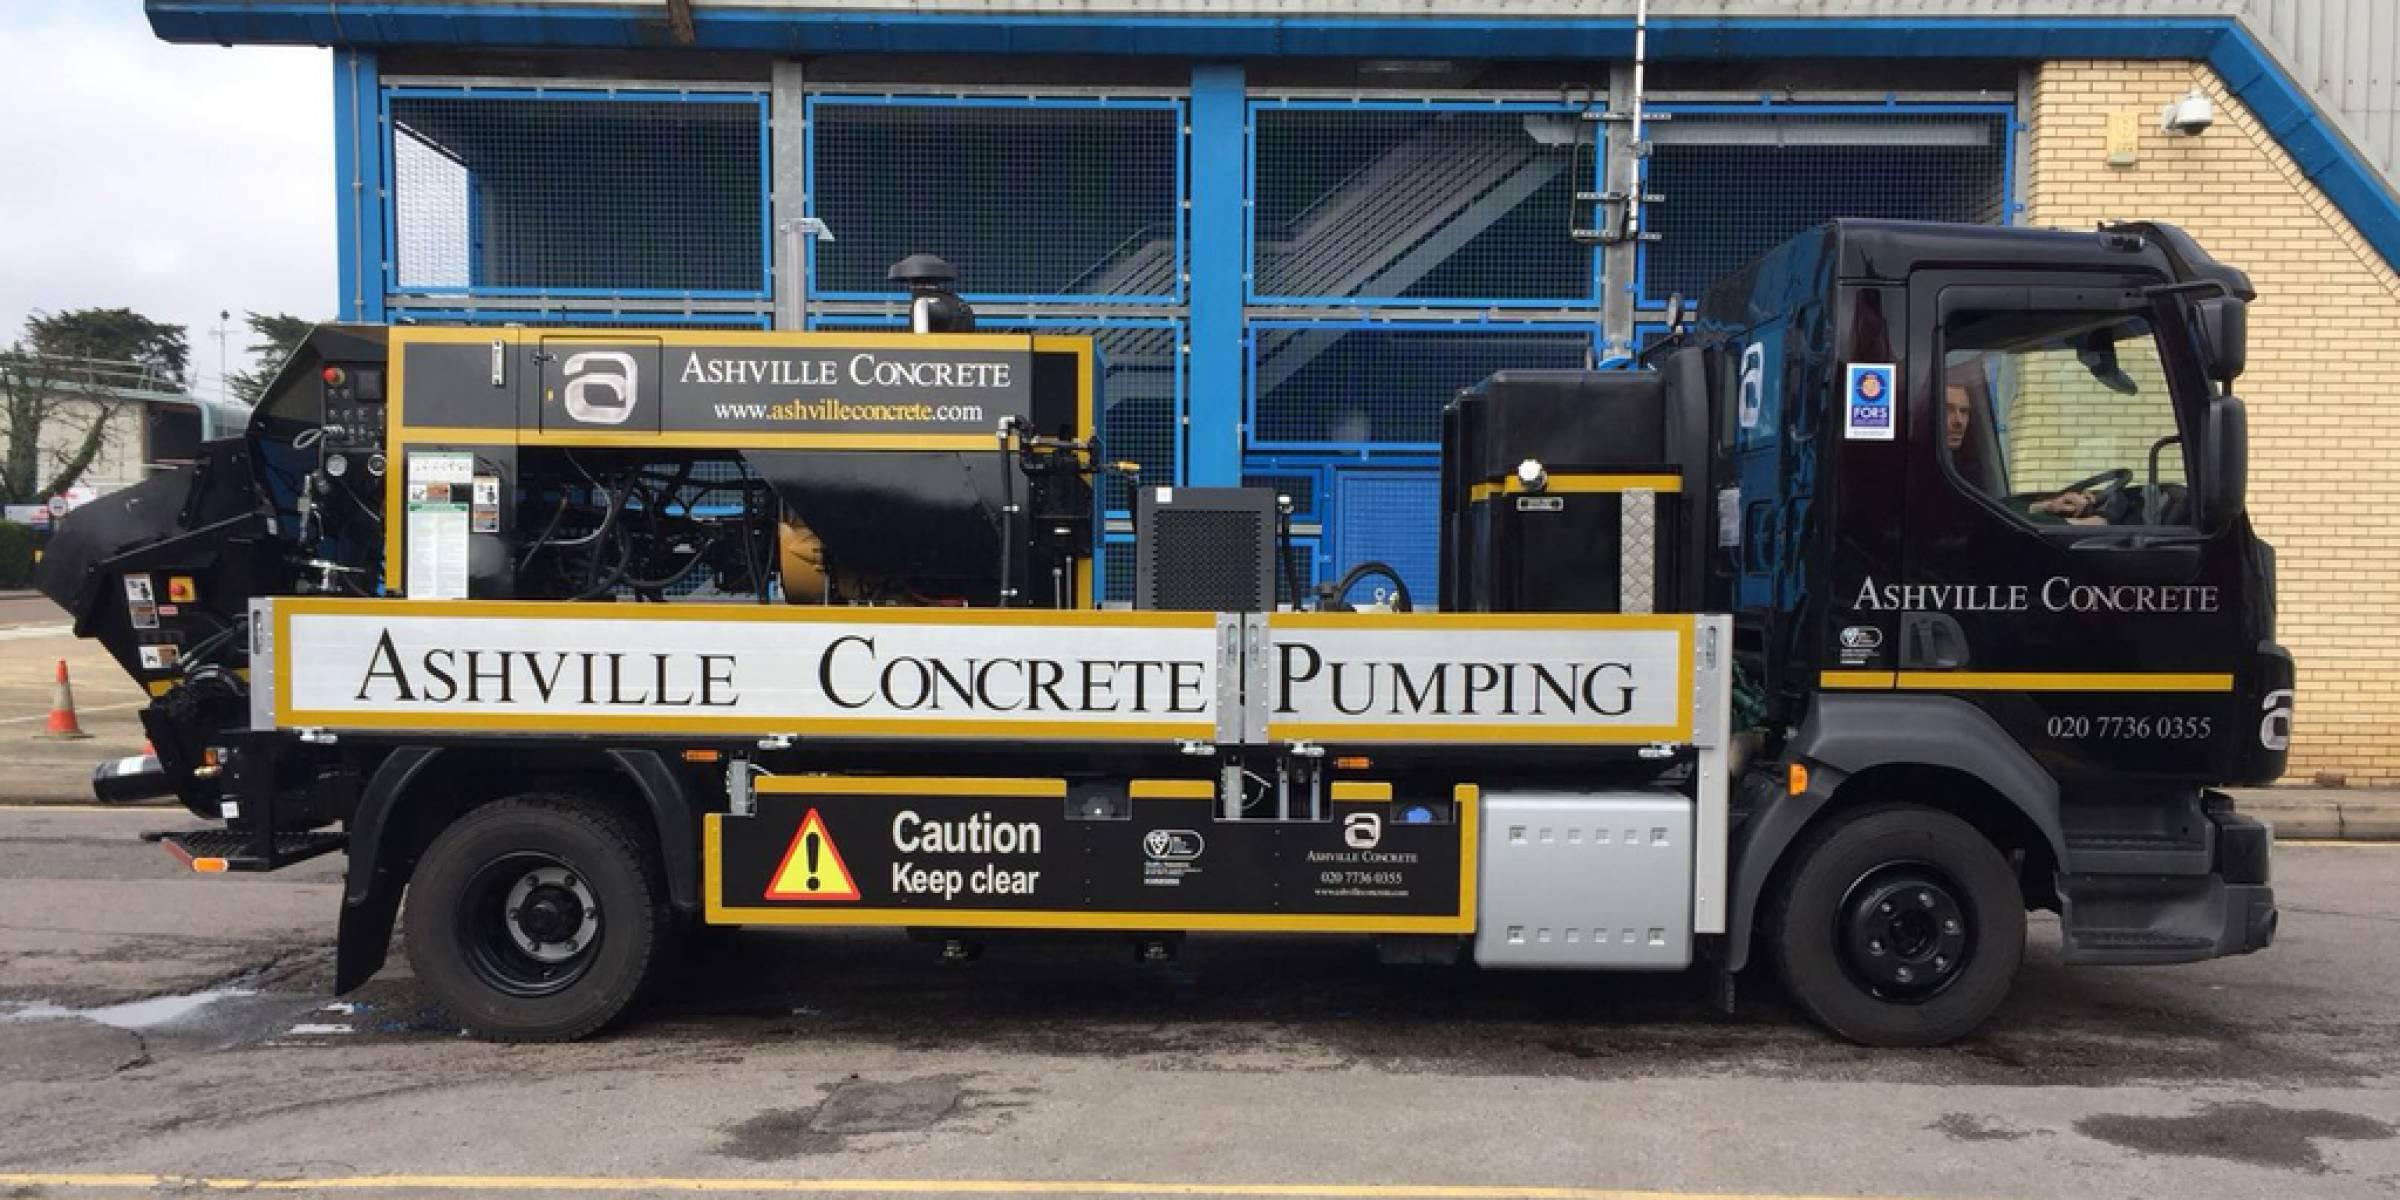 Ashville Inc: Building Contractors in London, Design and Build